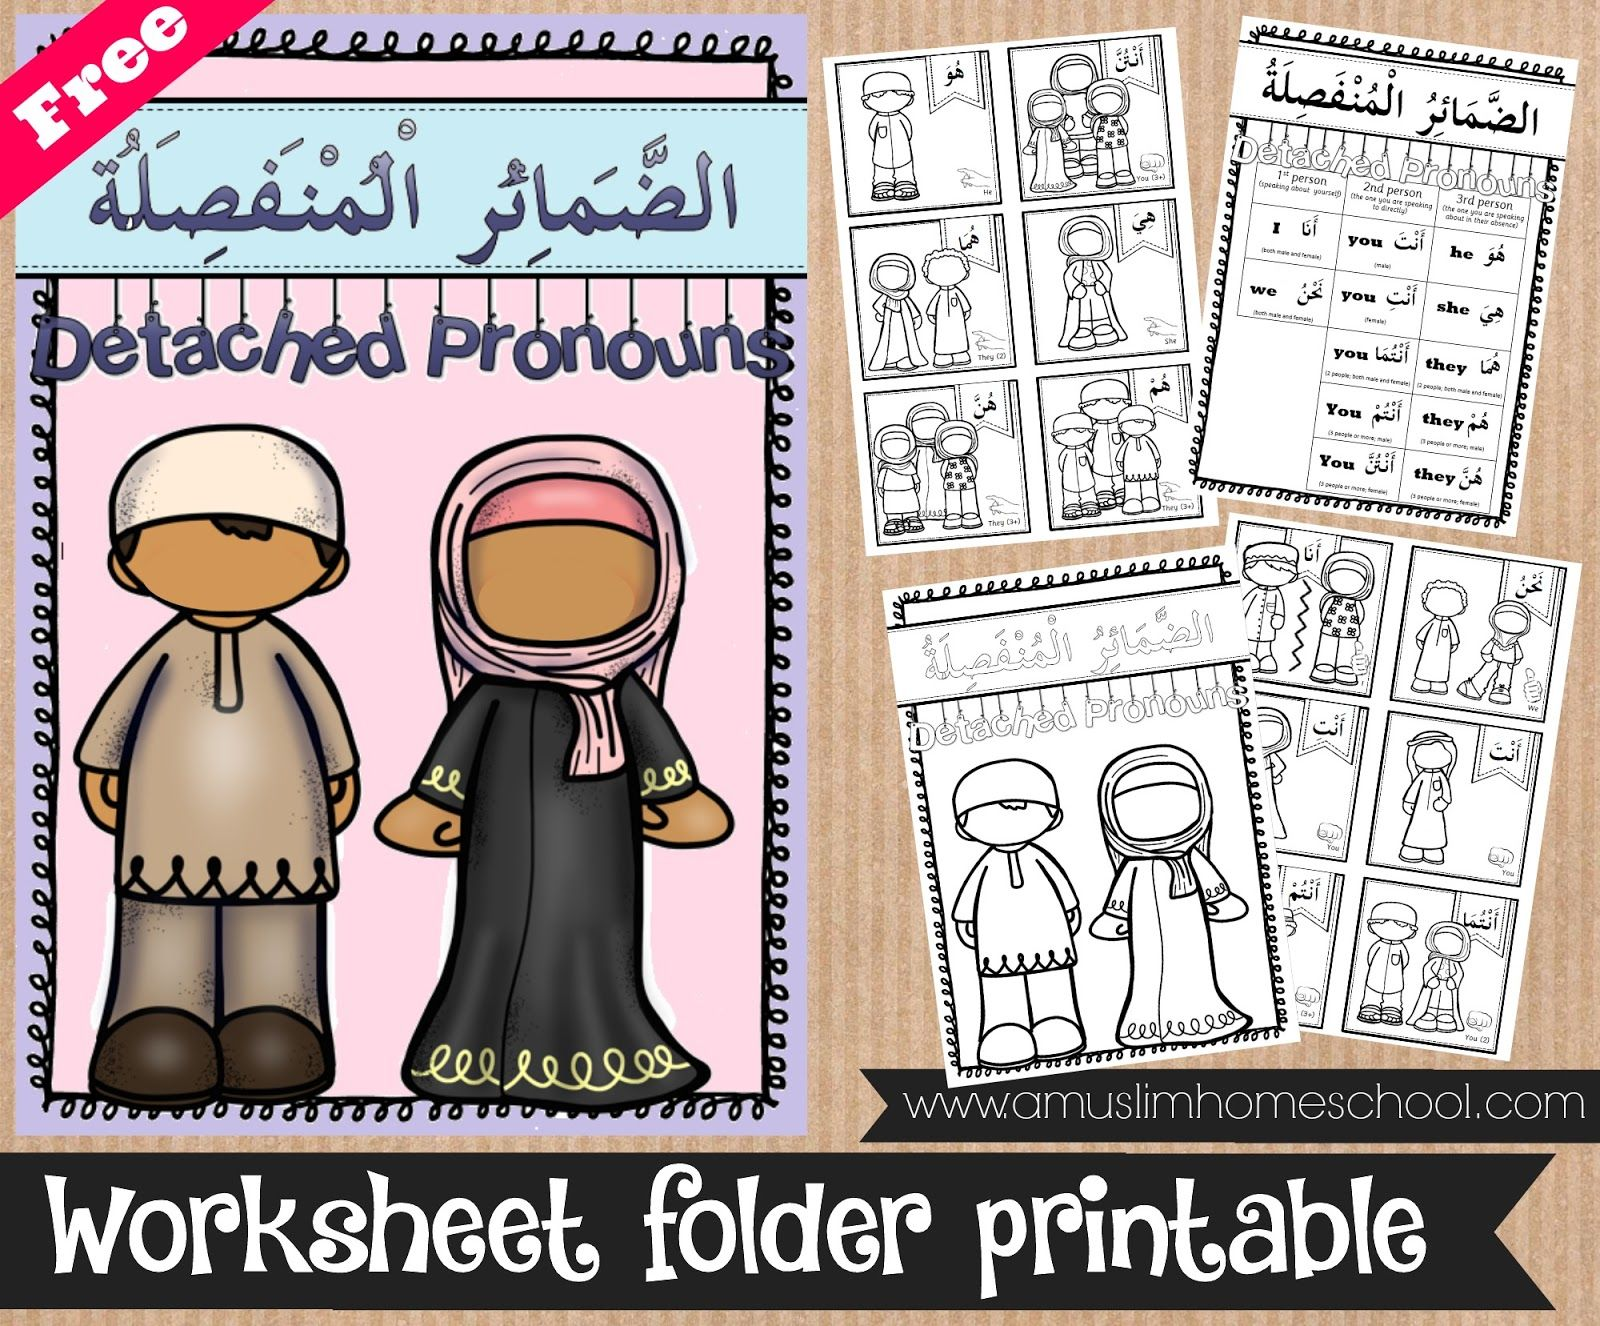 Arabic Detached Pronouns Worksheet Printable